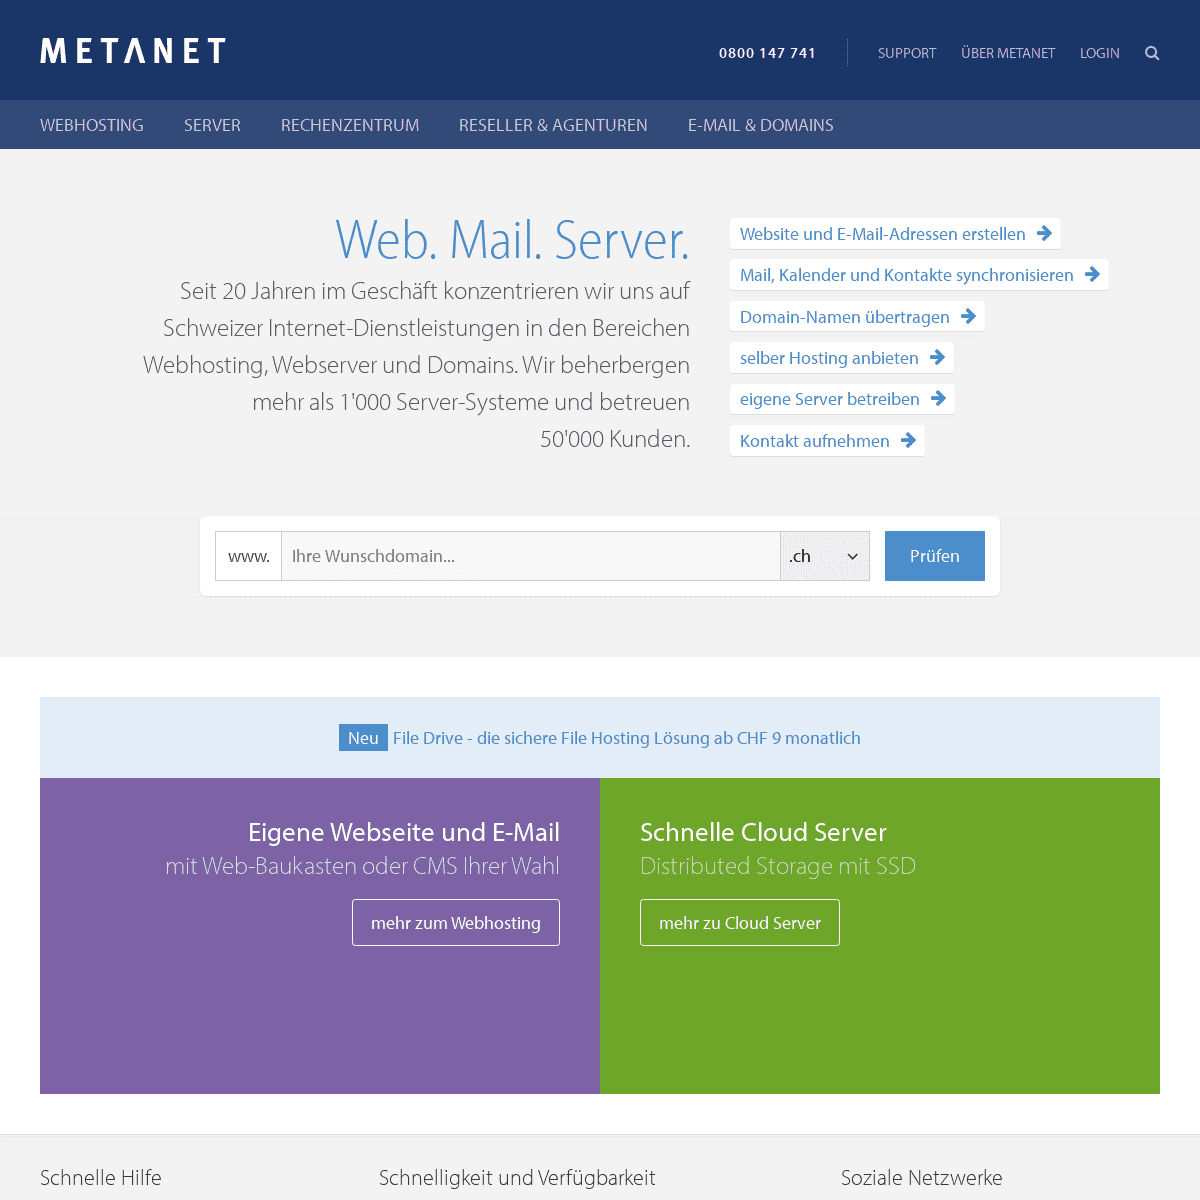 Home - METANET - Web. Mail. Server.